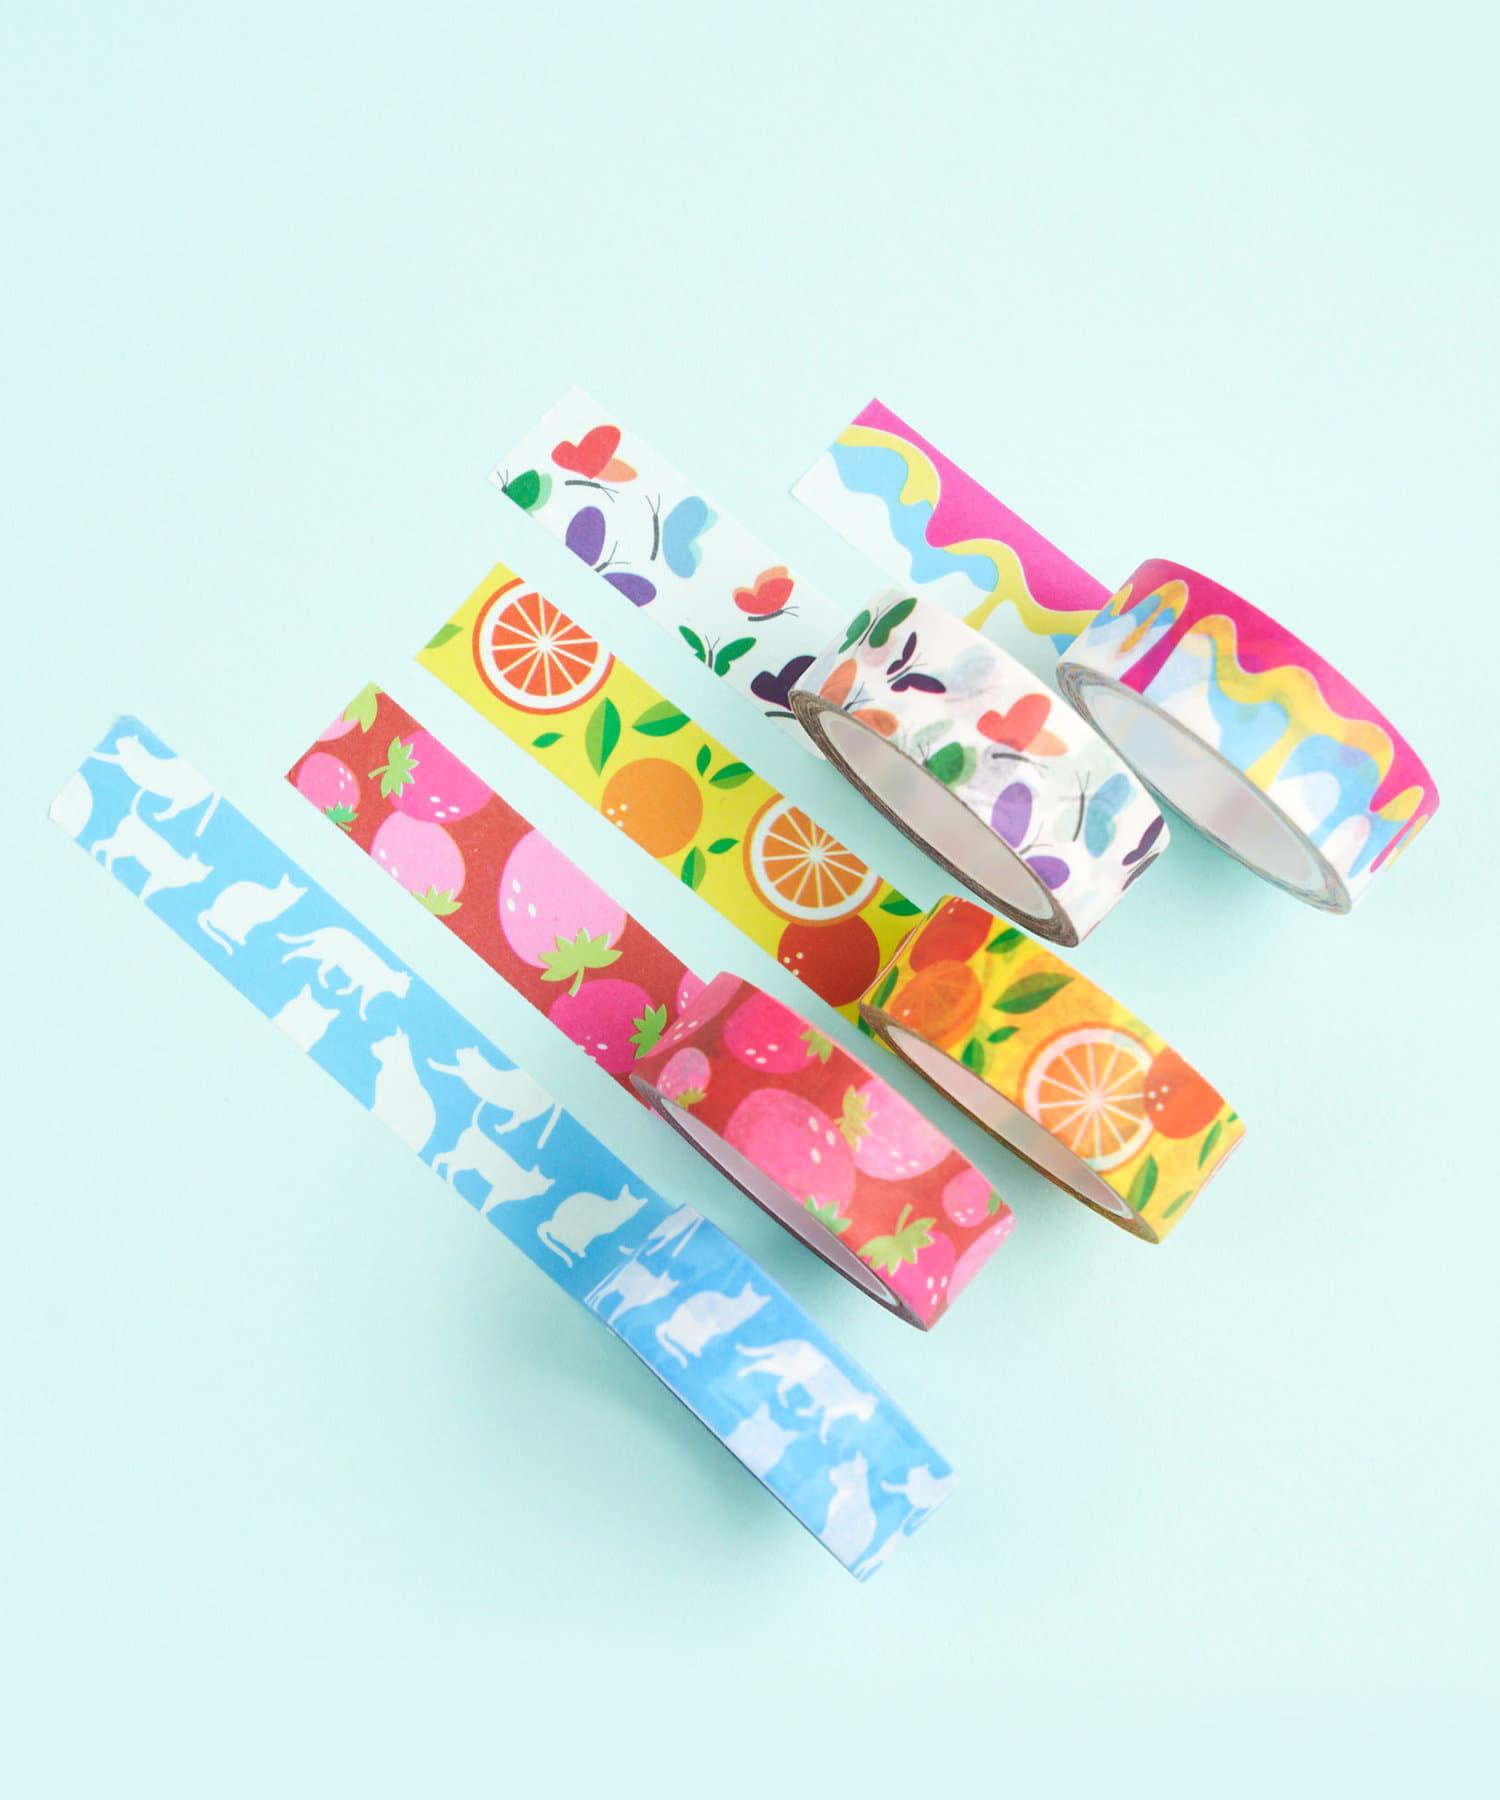 ASOKO(アソコ) 【WEB限定セット】マスキングテープ5個セット